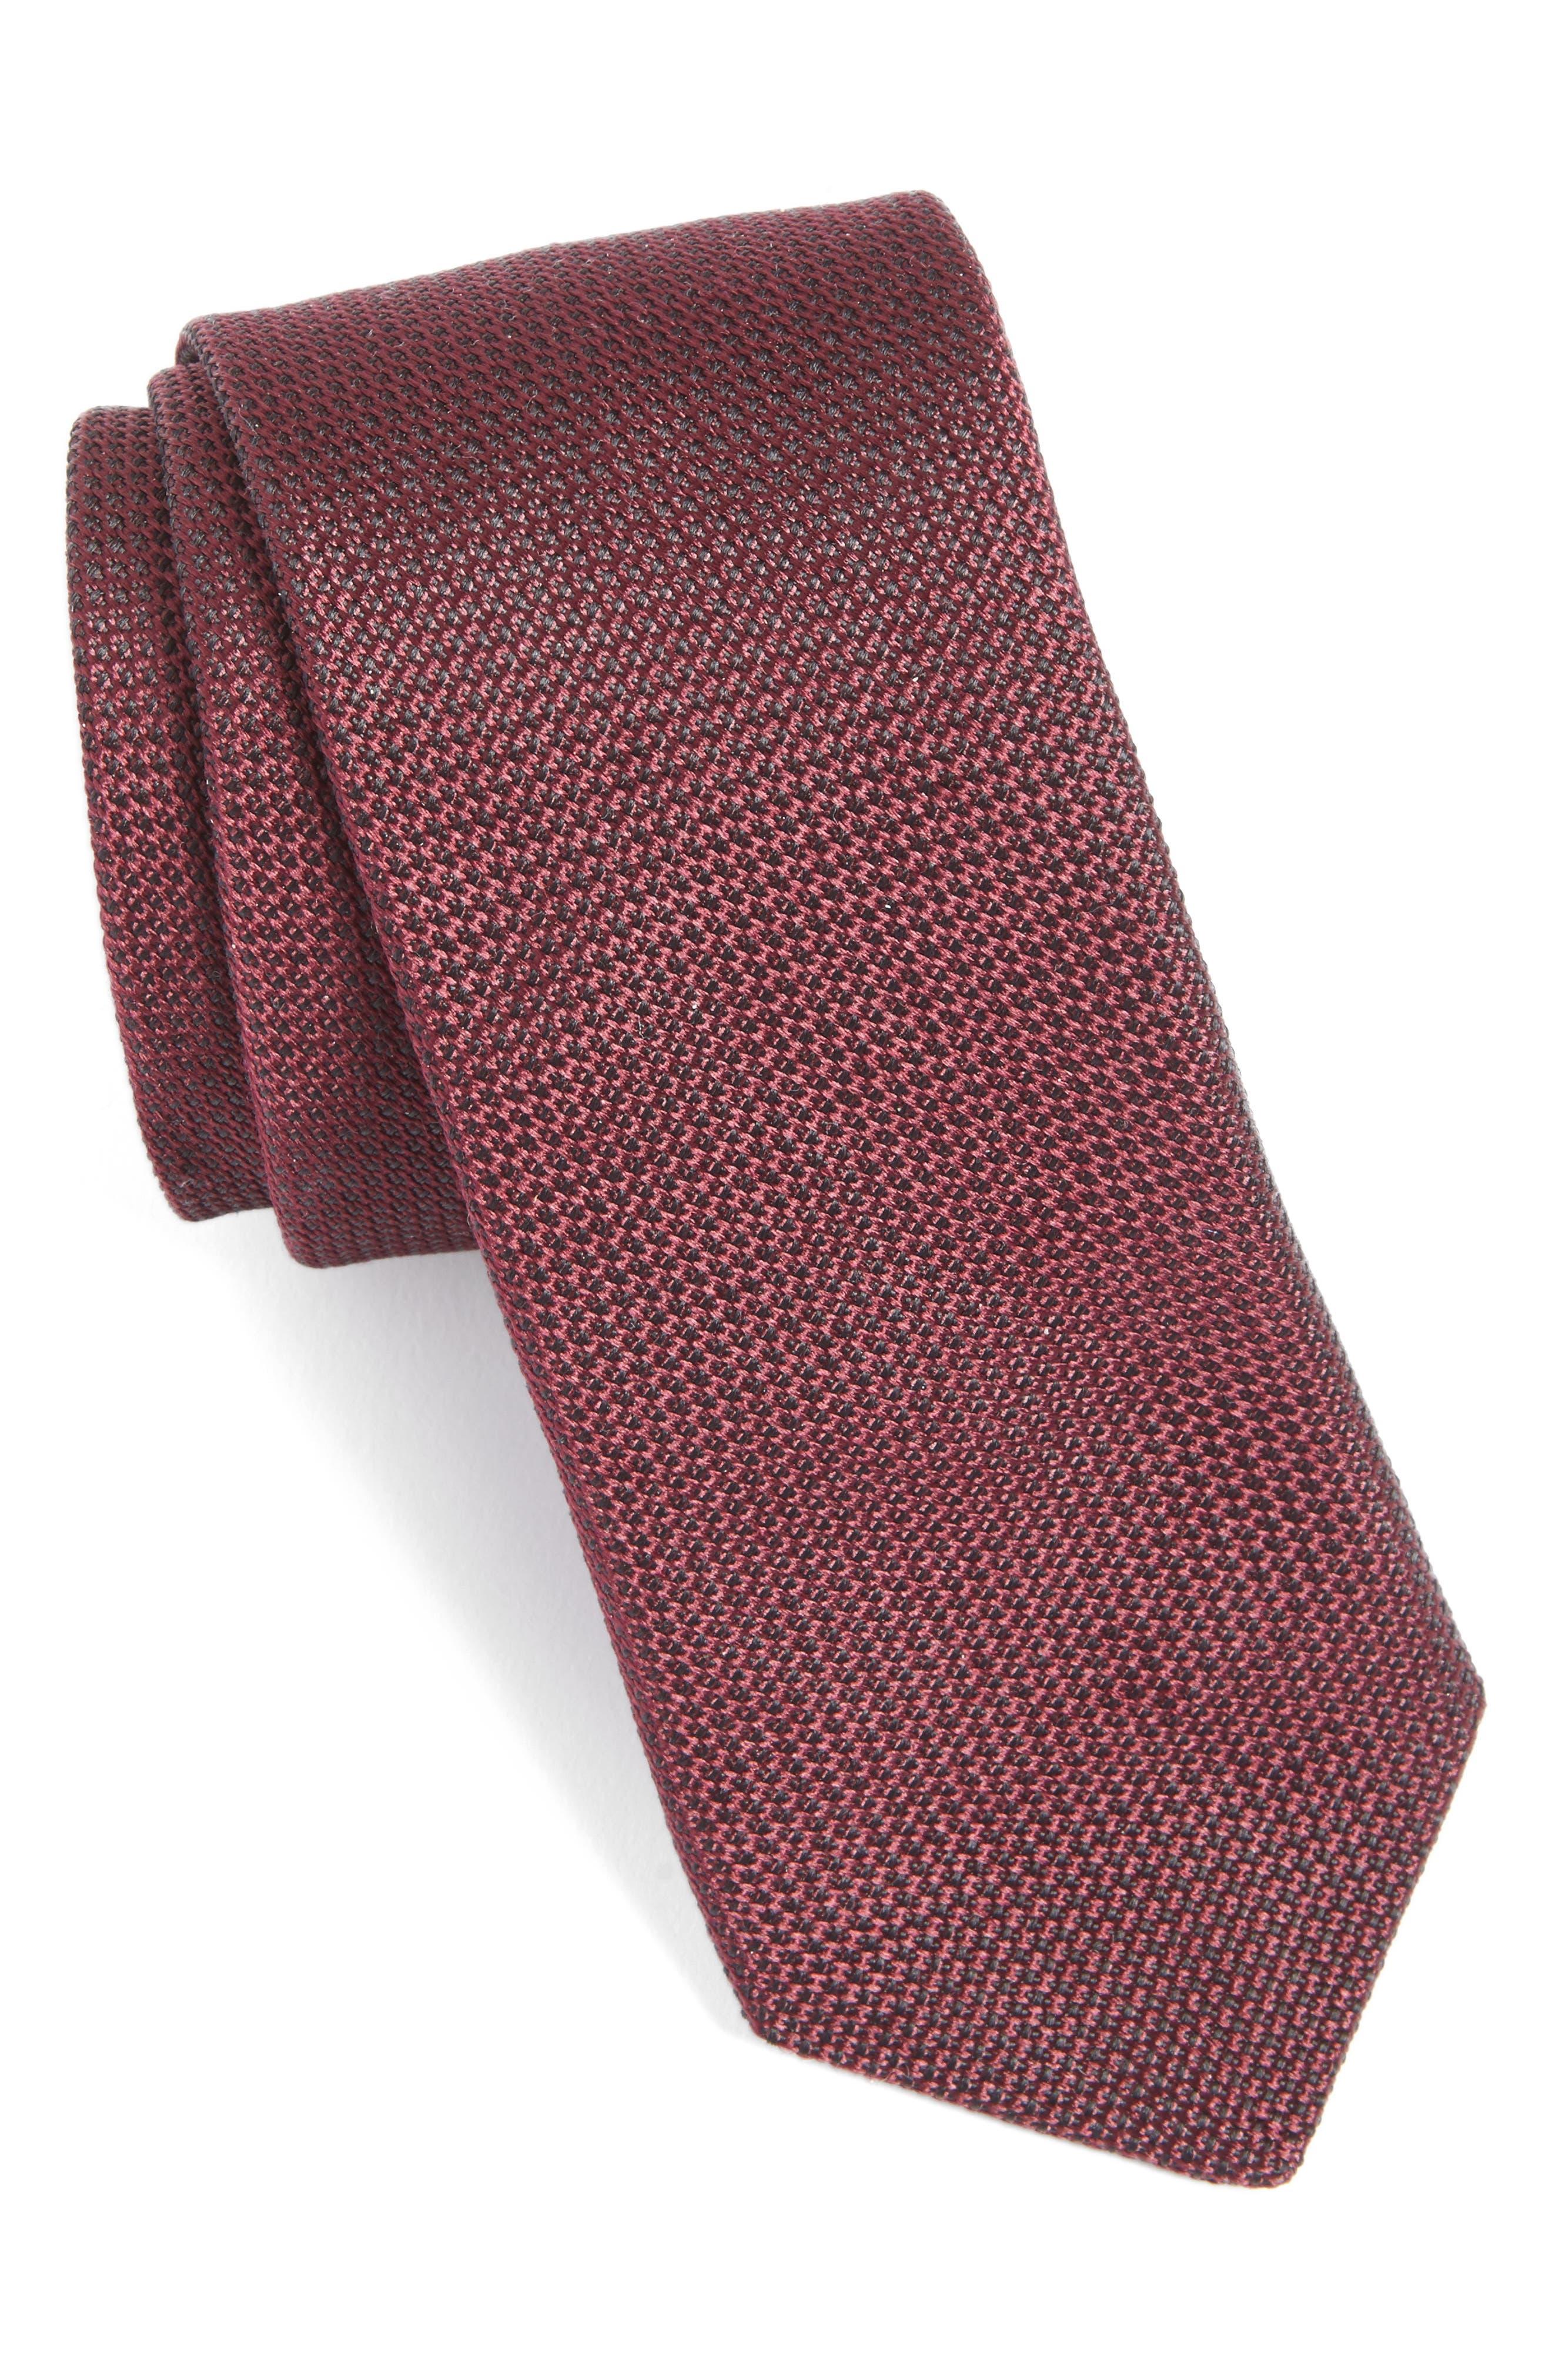 Alternate Image 1 Selected - Ted Baker London Solid Silk Tie